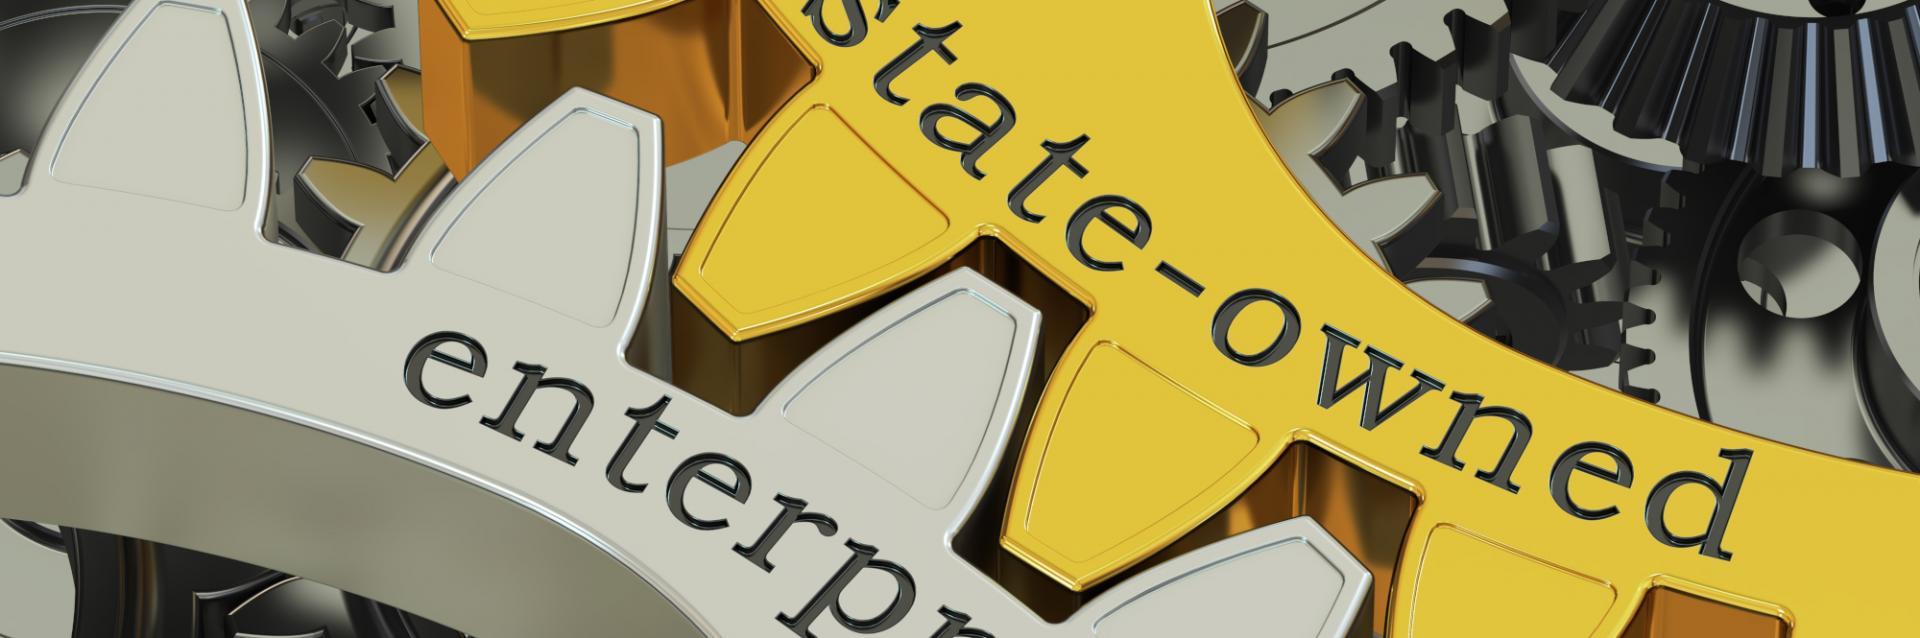 ECA Convenes a Virtual Validation Meeting on SOEs